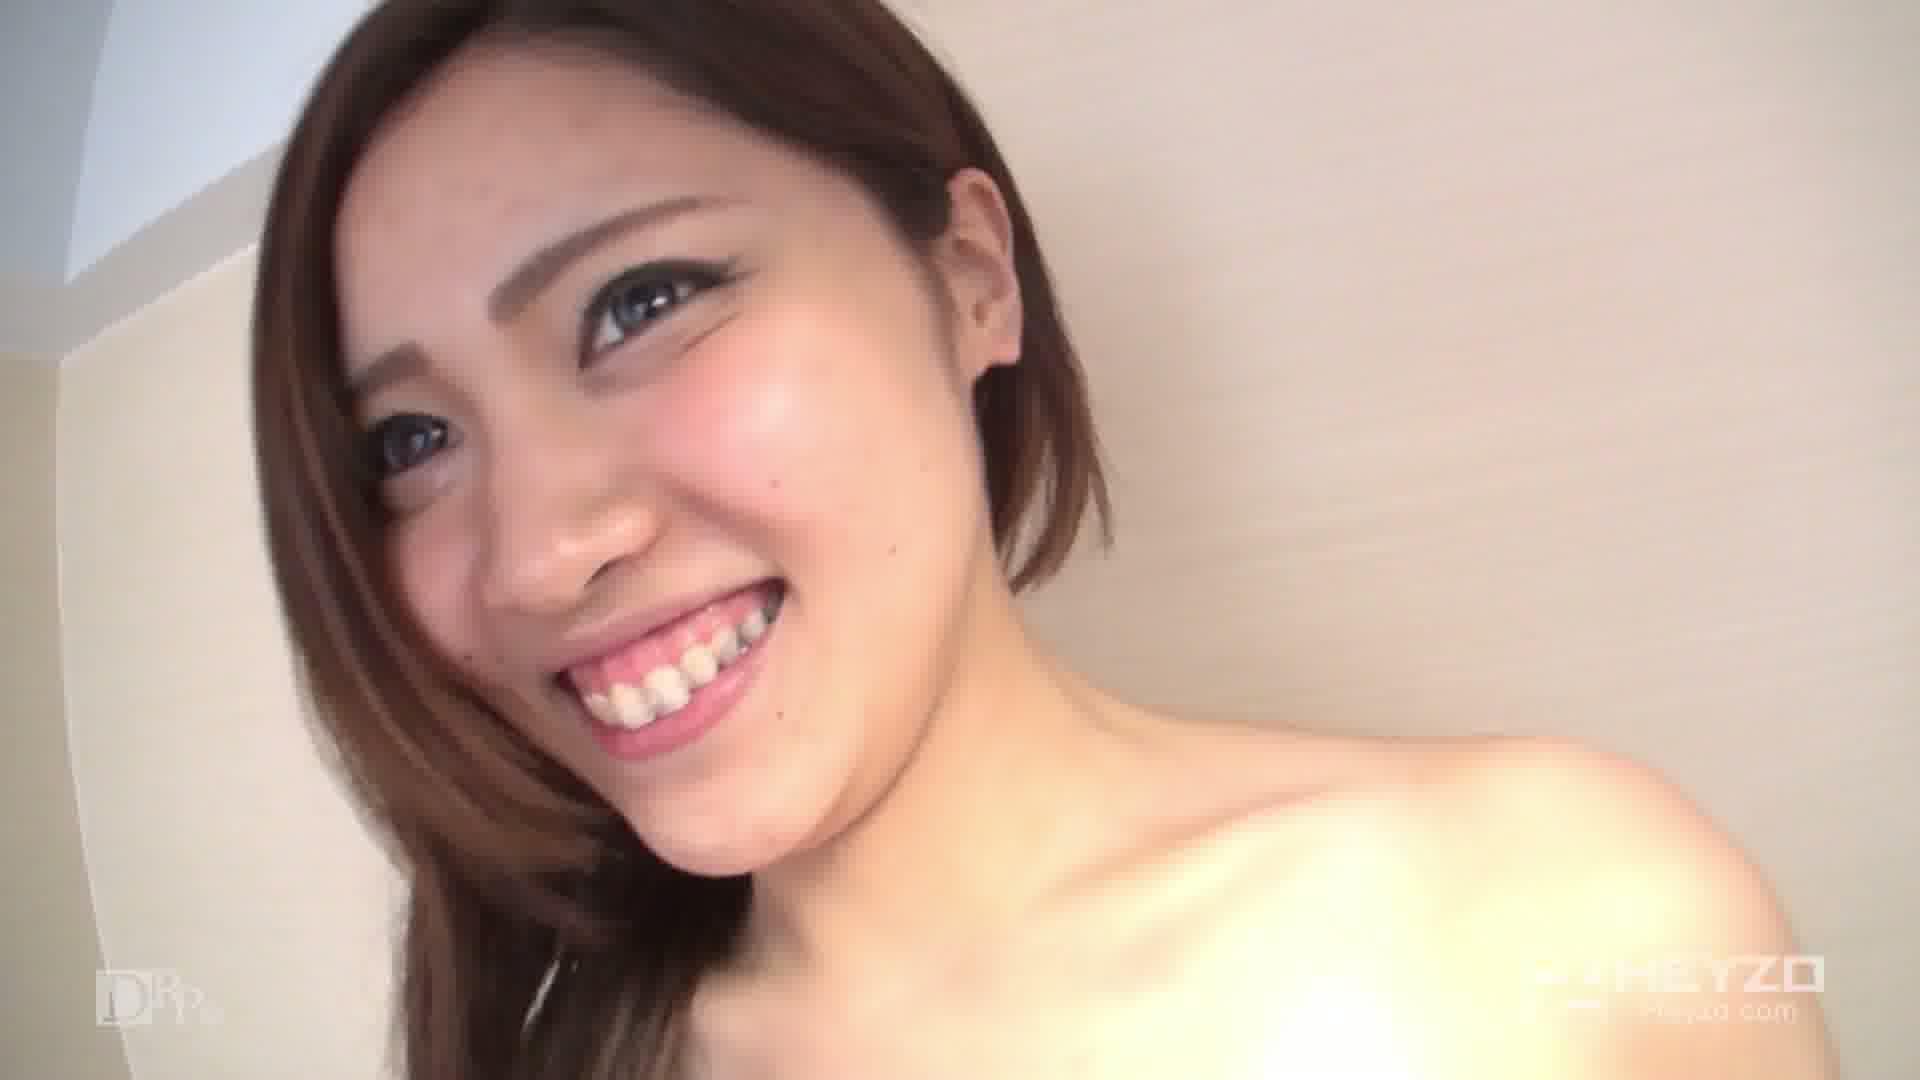 HAMEZO~ハメ撮りコレクション~vol.33 - 夏目あや【インタビュー 脱衣 指マン】